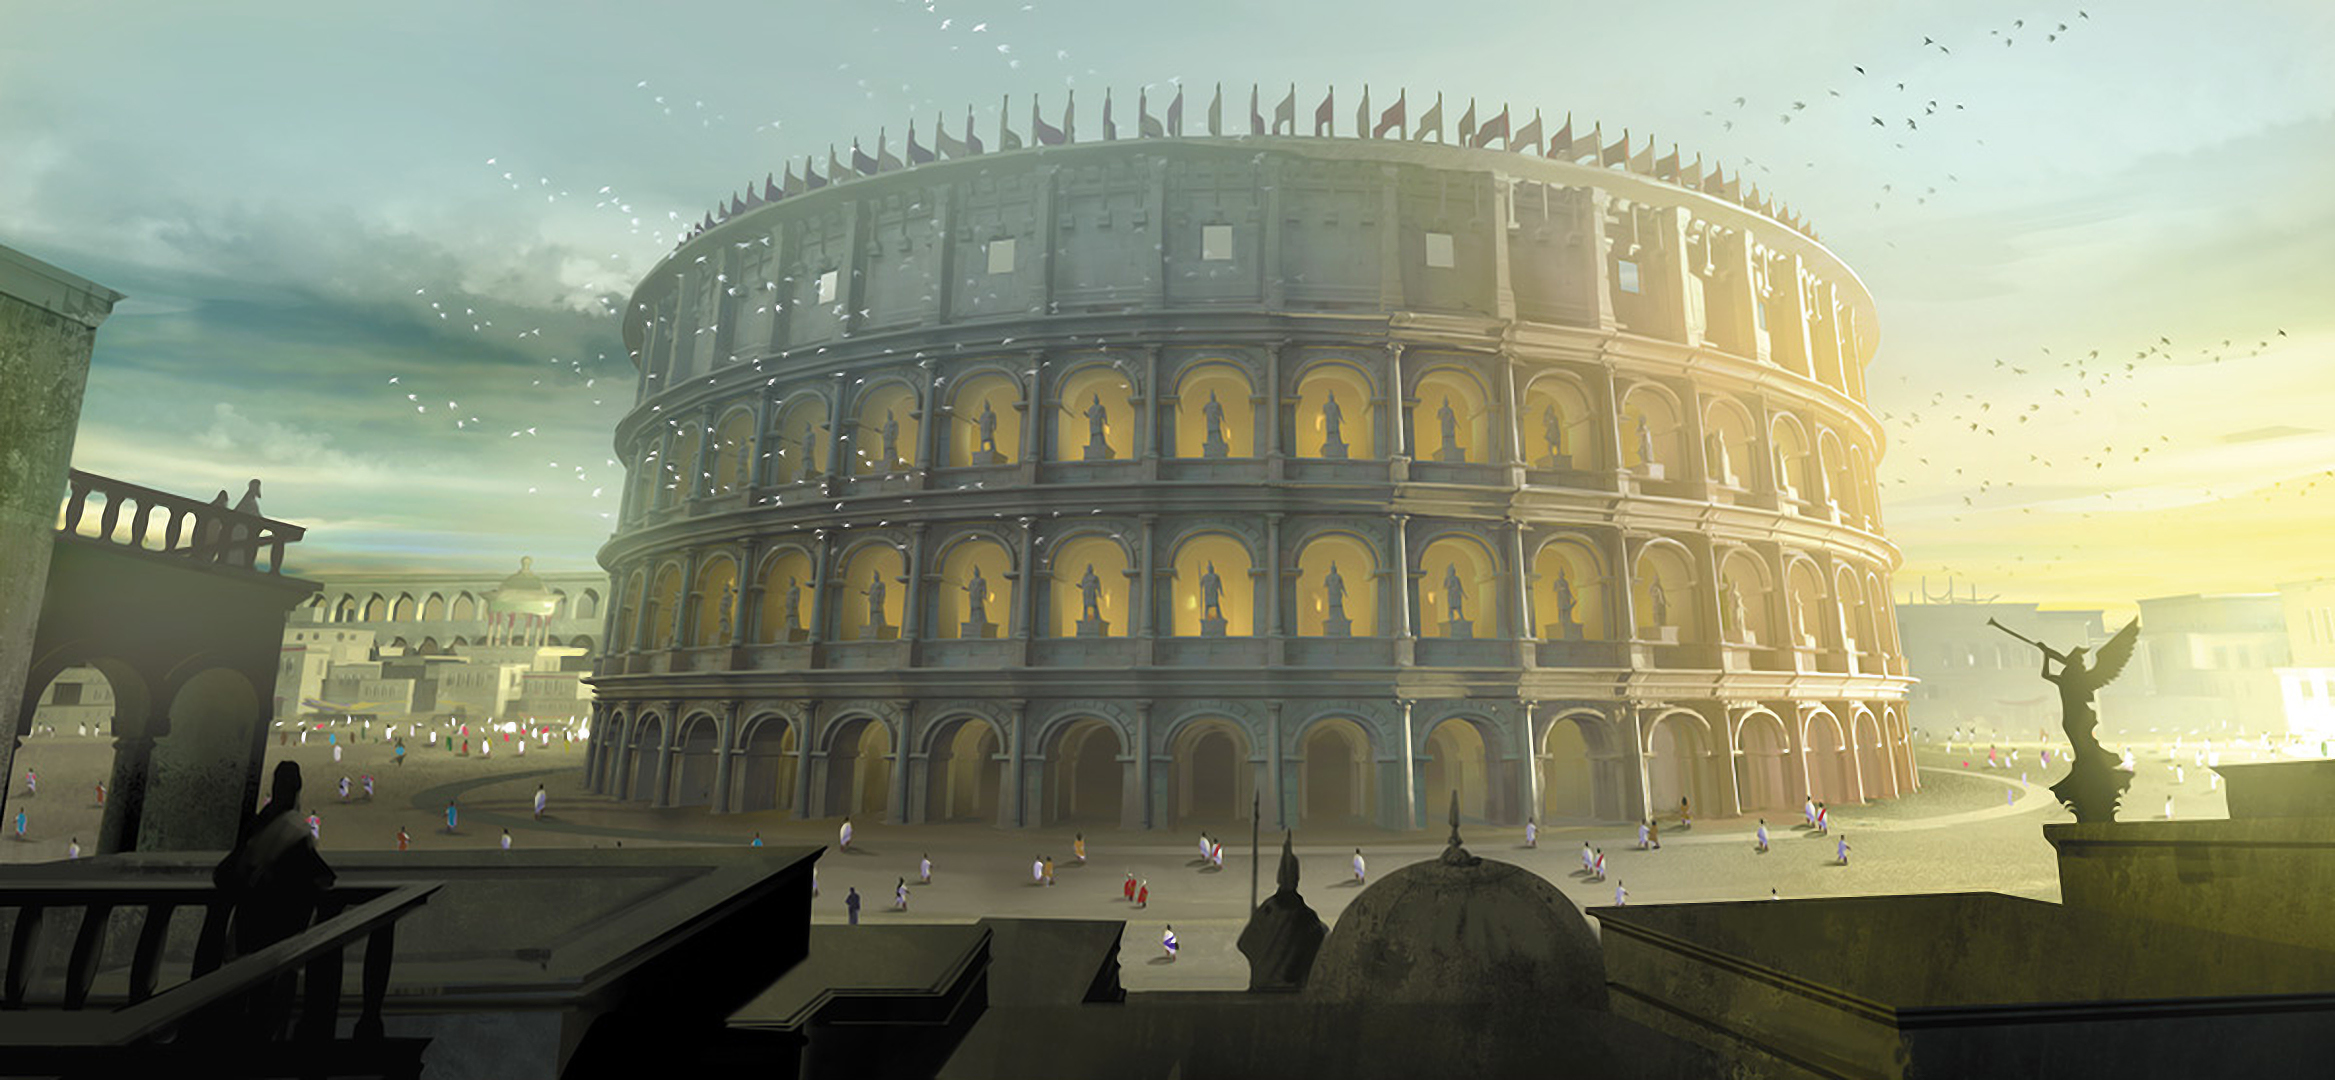 https://img2.goodfon.com/original/2335x1080/6/f1/colosseum-ancient-art-painting.jpg